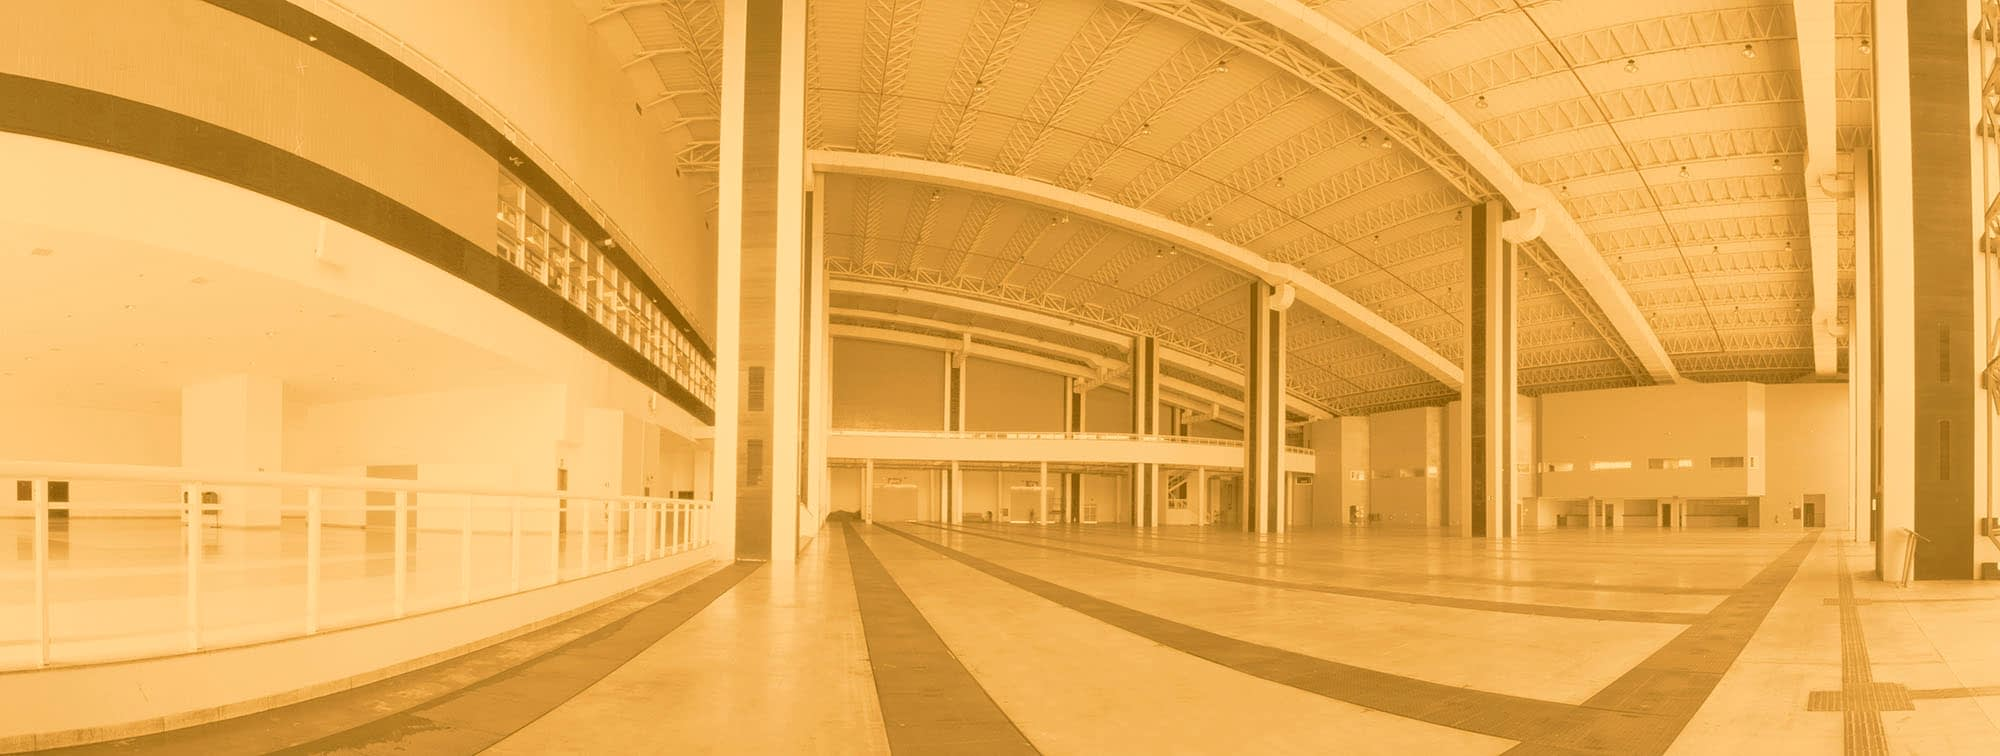 Ala Sul Panorama Conceito 2